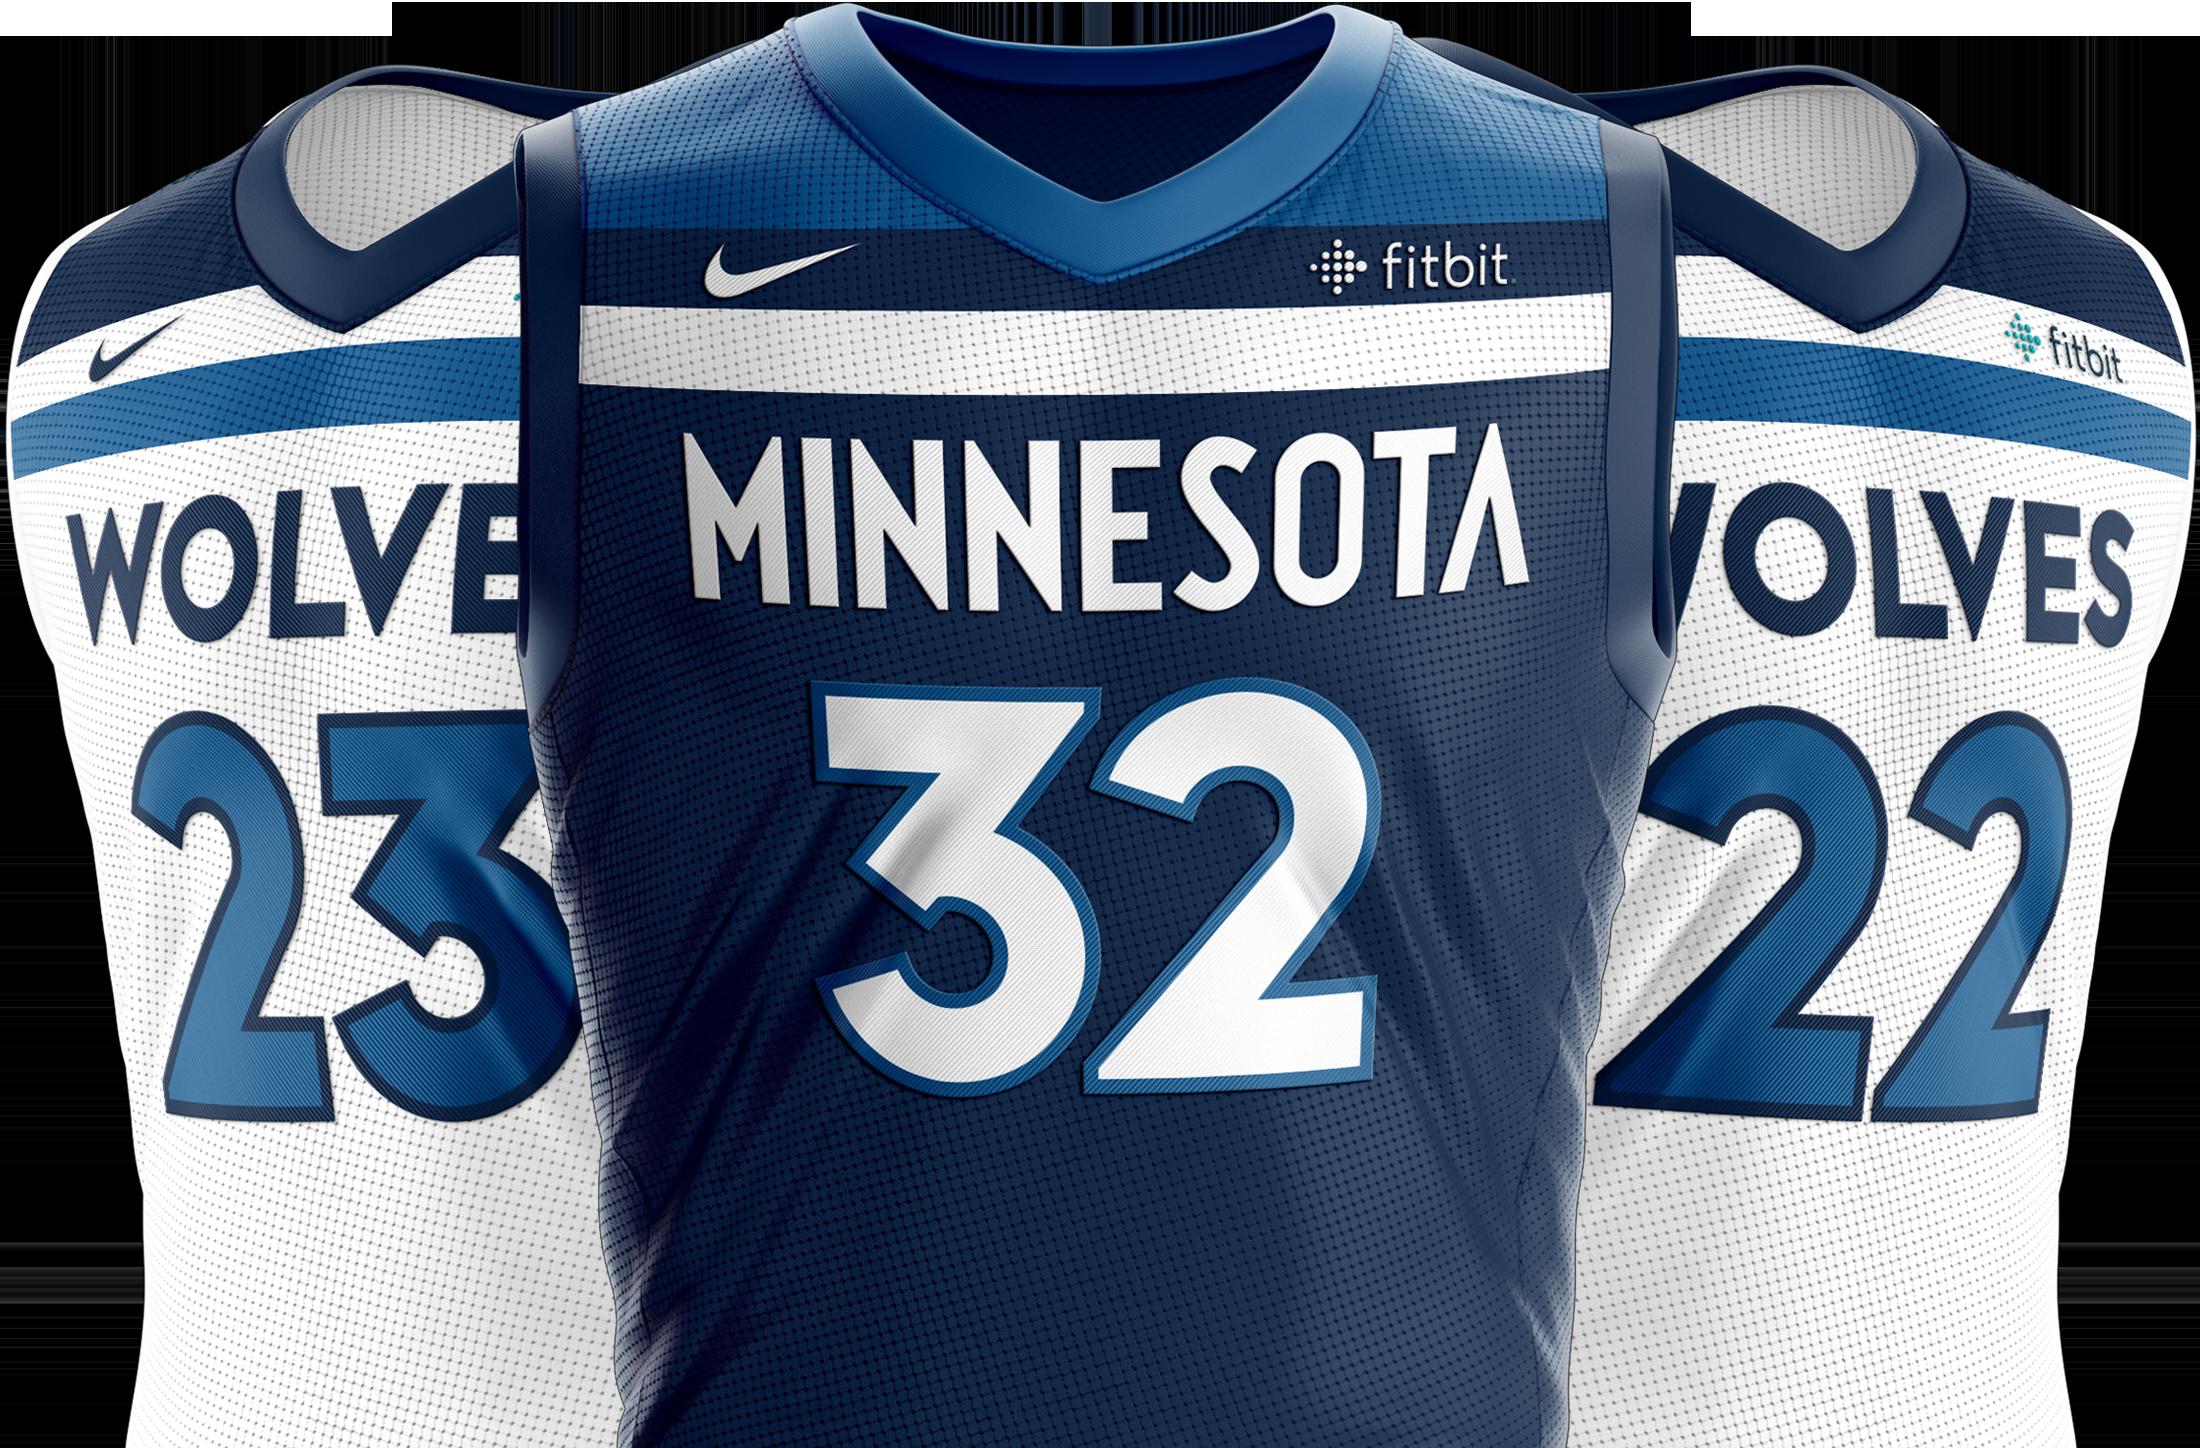 mntw-jersey-unveil-hero-final-170808